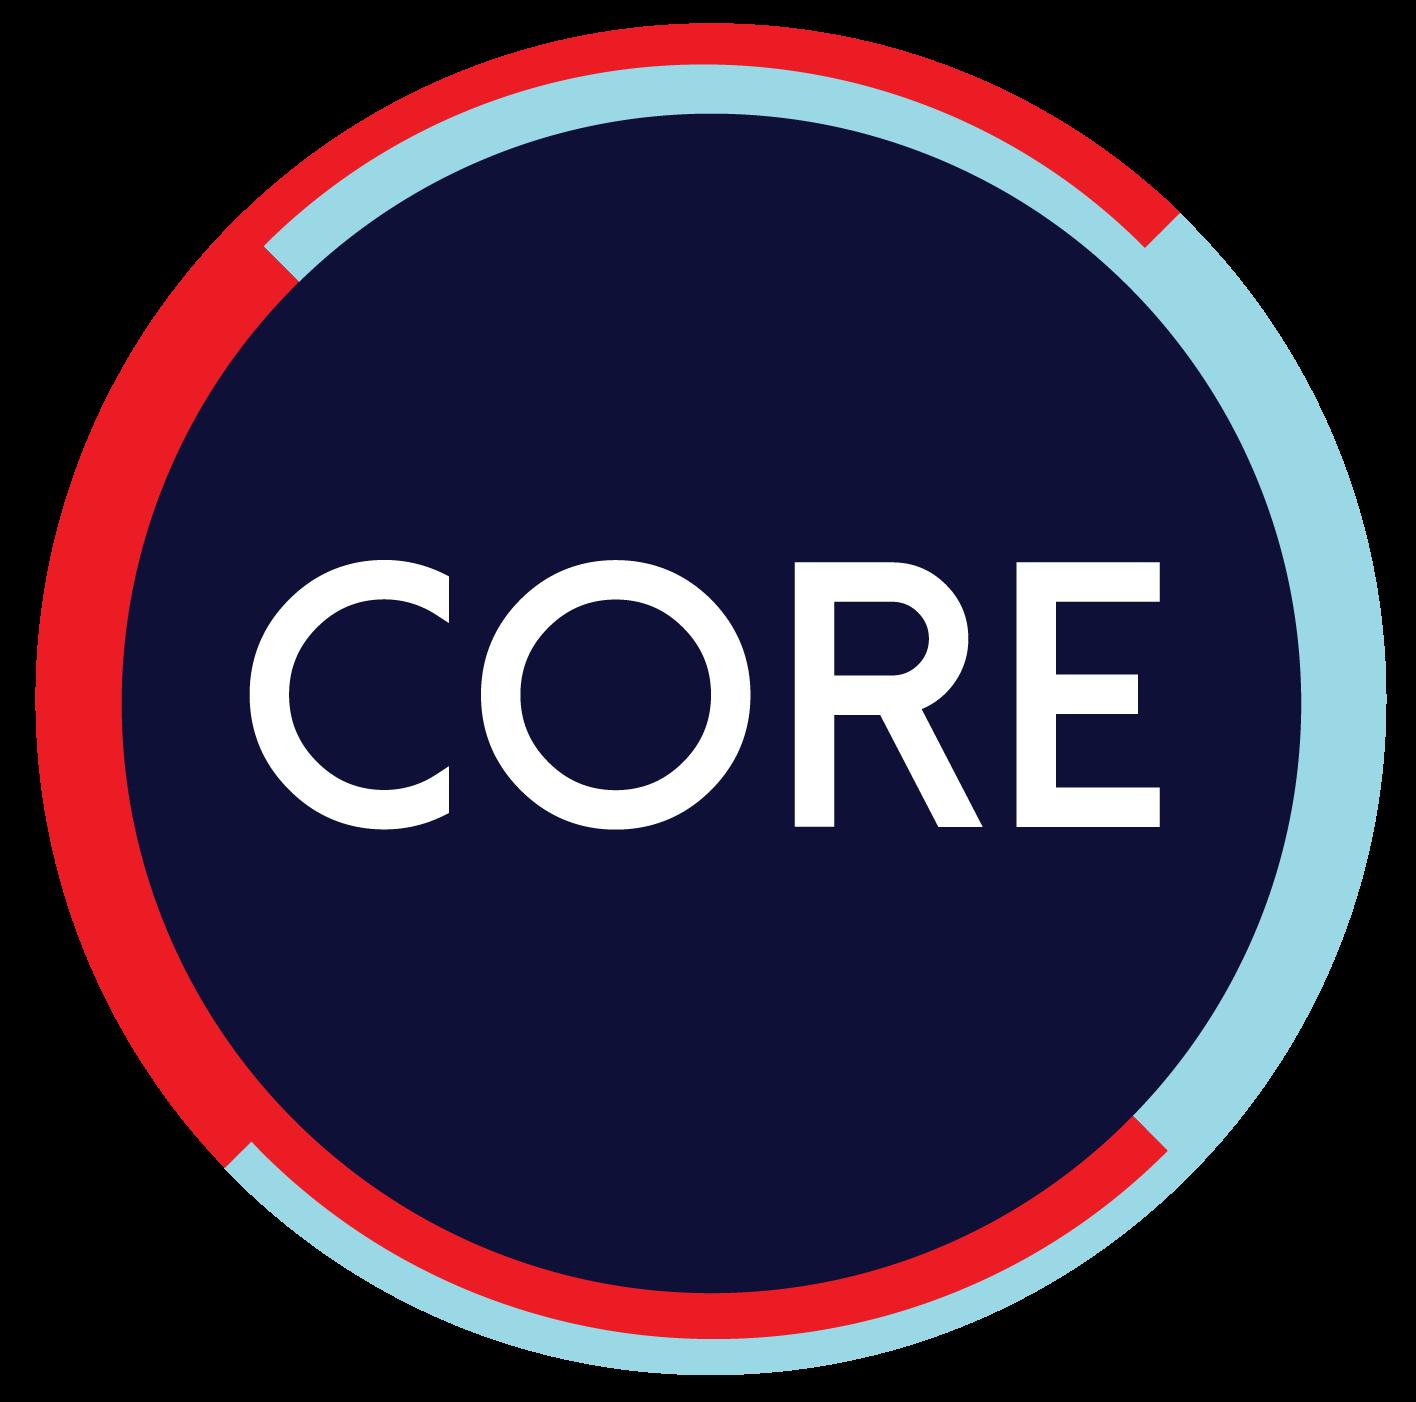 Core_Horizontal_DarkCircle-HIGHRES (2).png